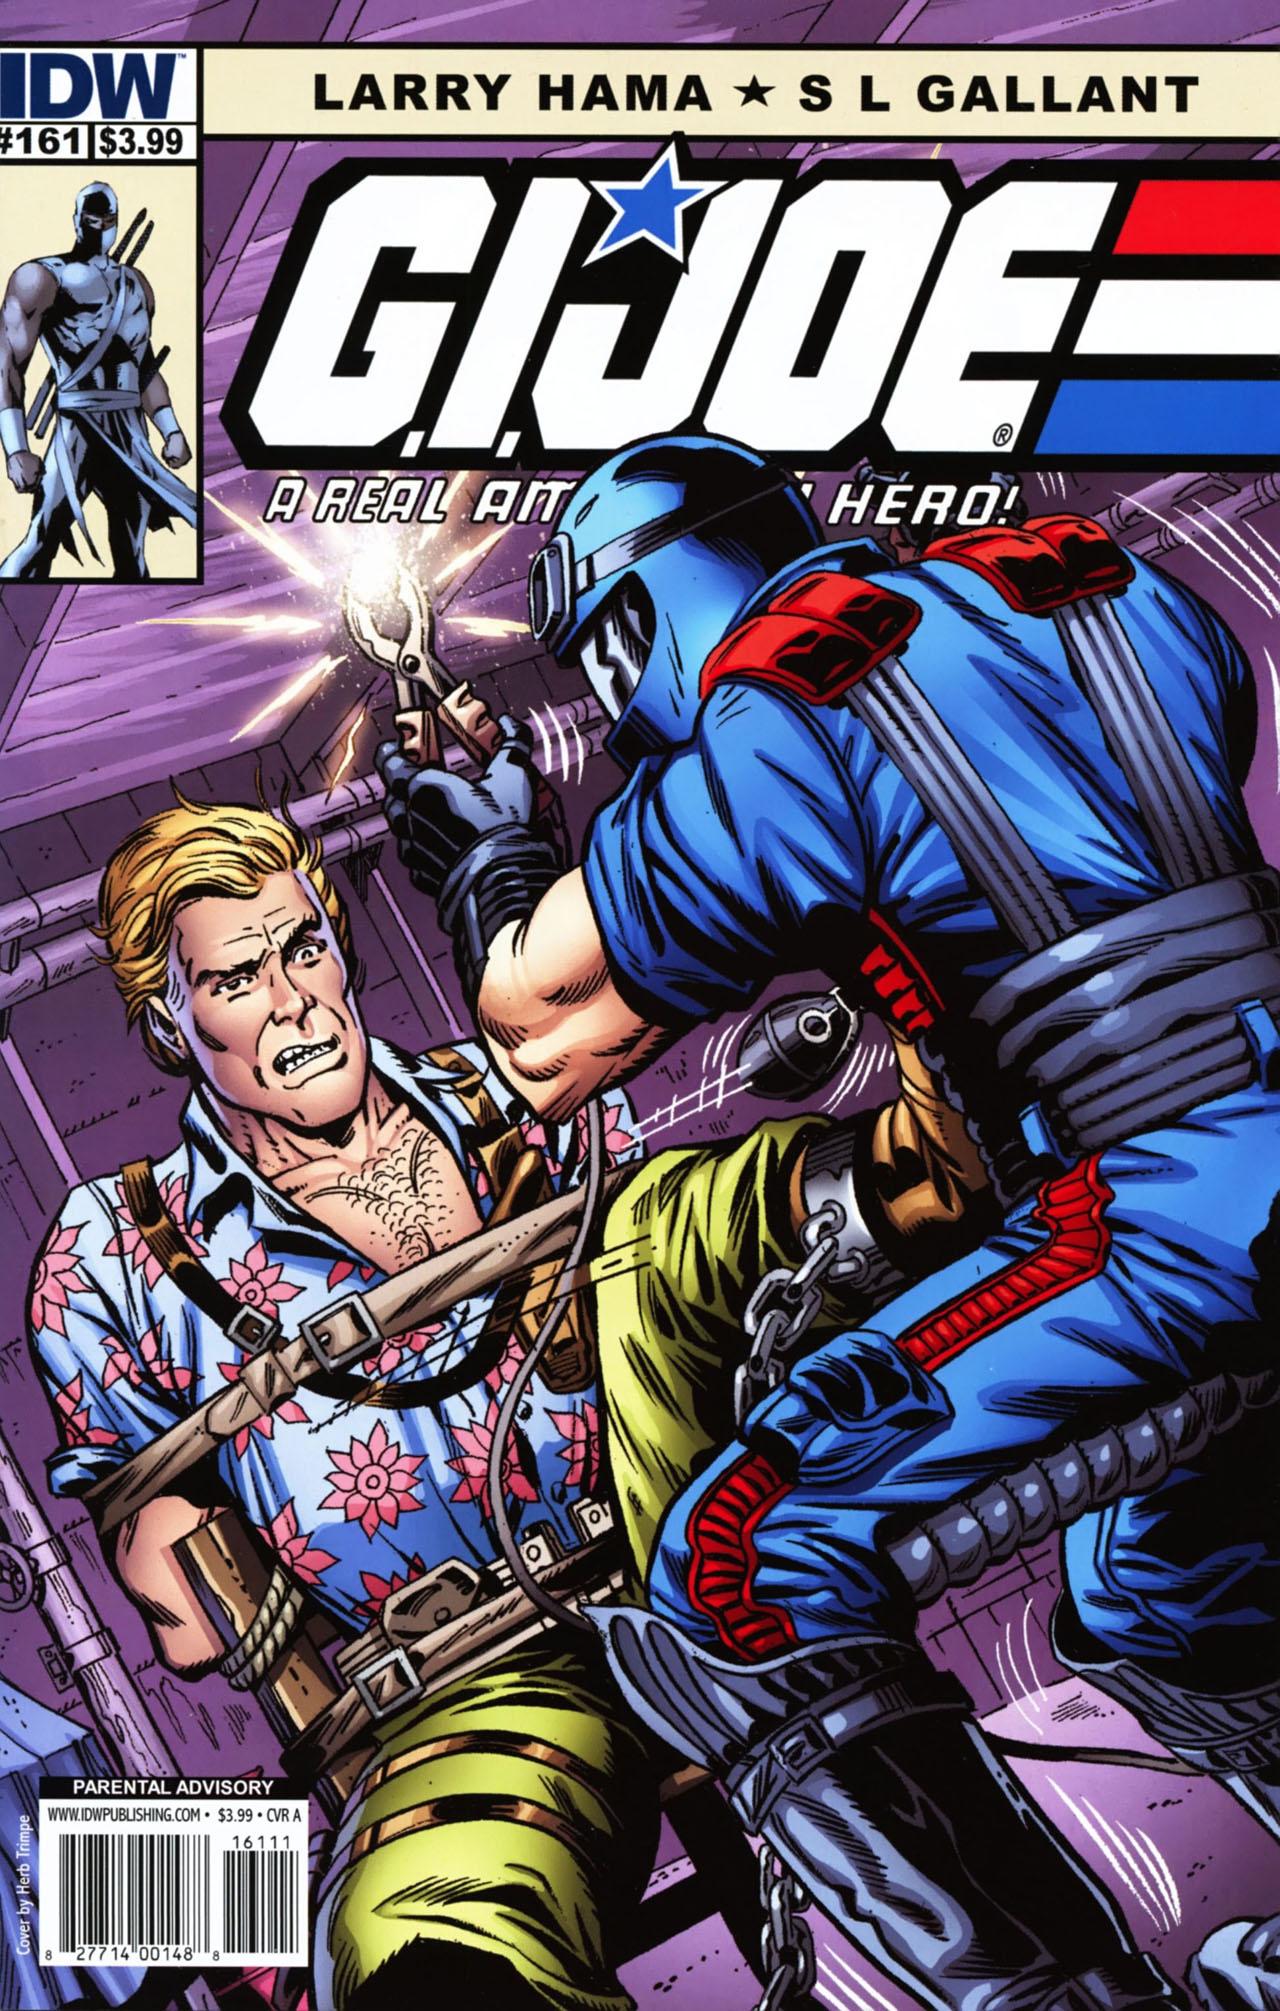 G.I. Joe: A Real American Hero 161 Page 1